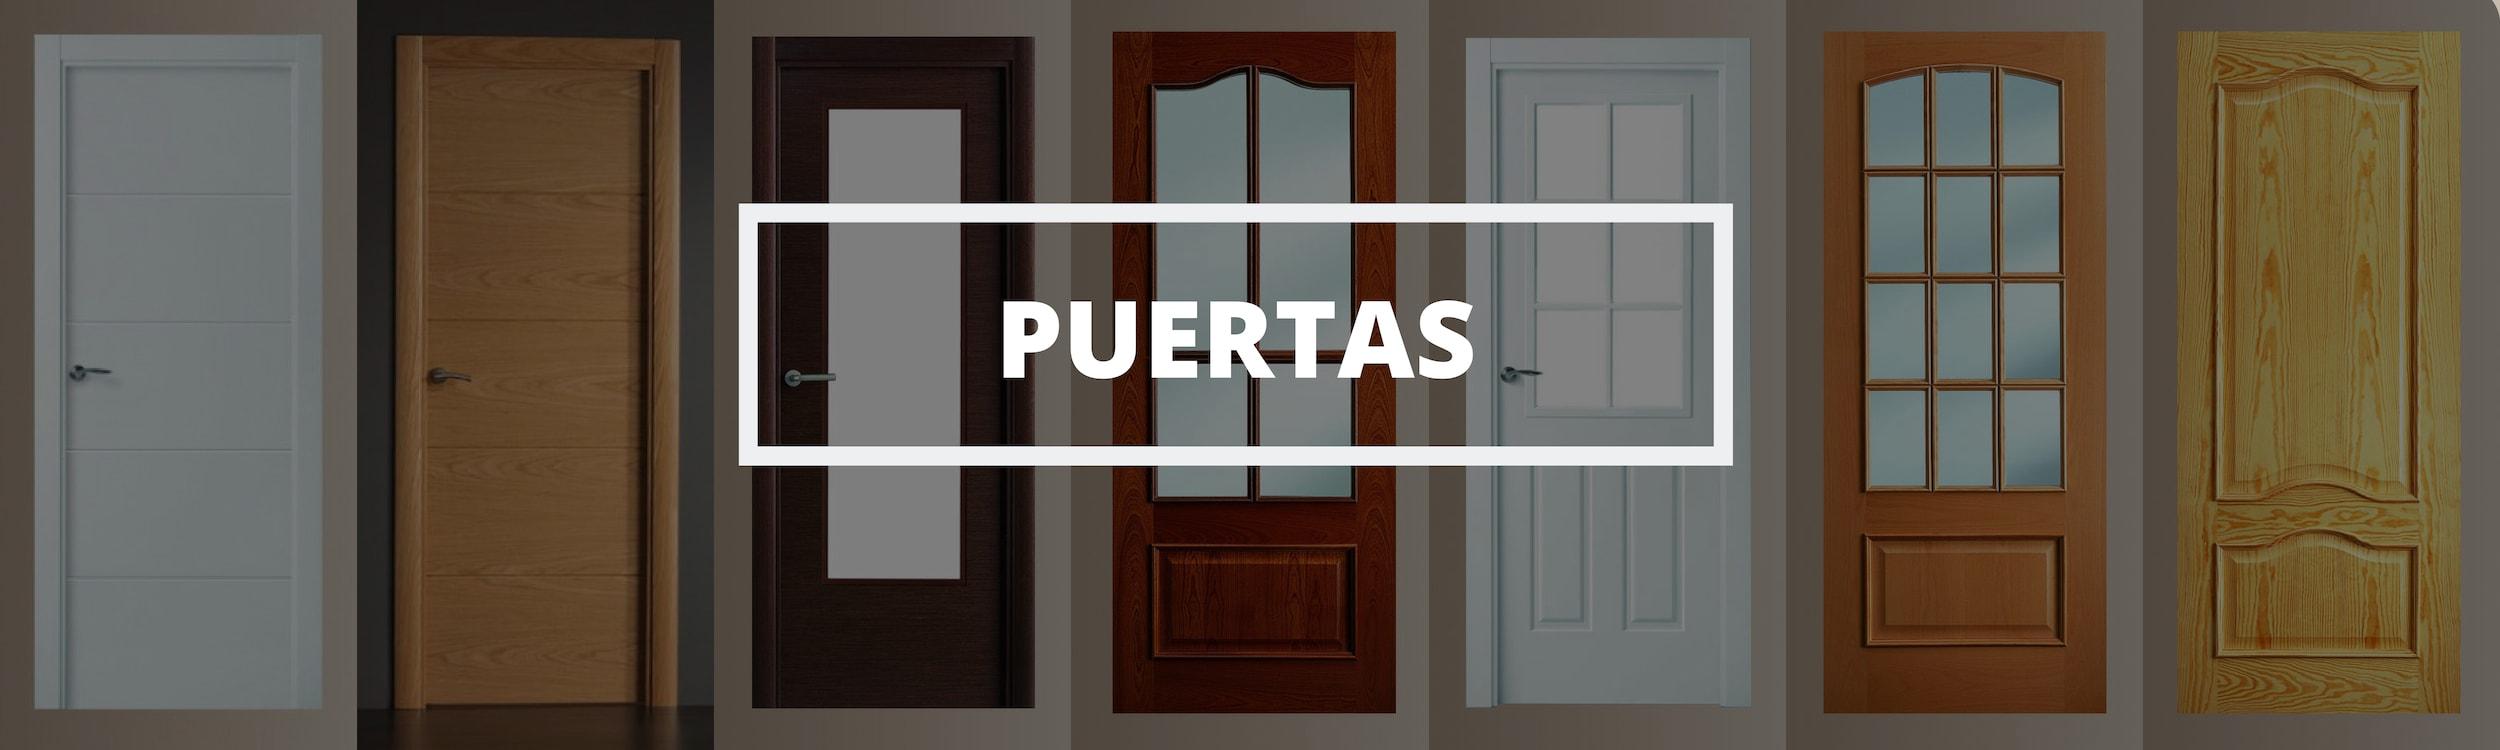 Puertas Pamplona Madera